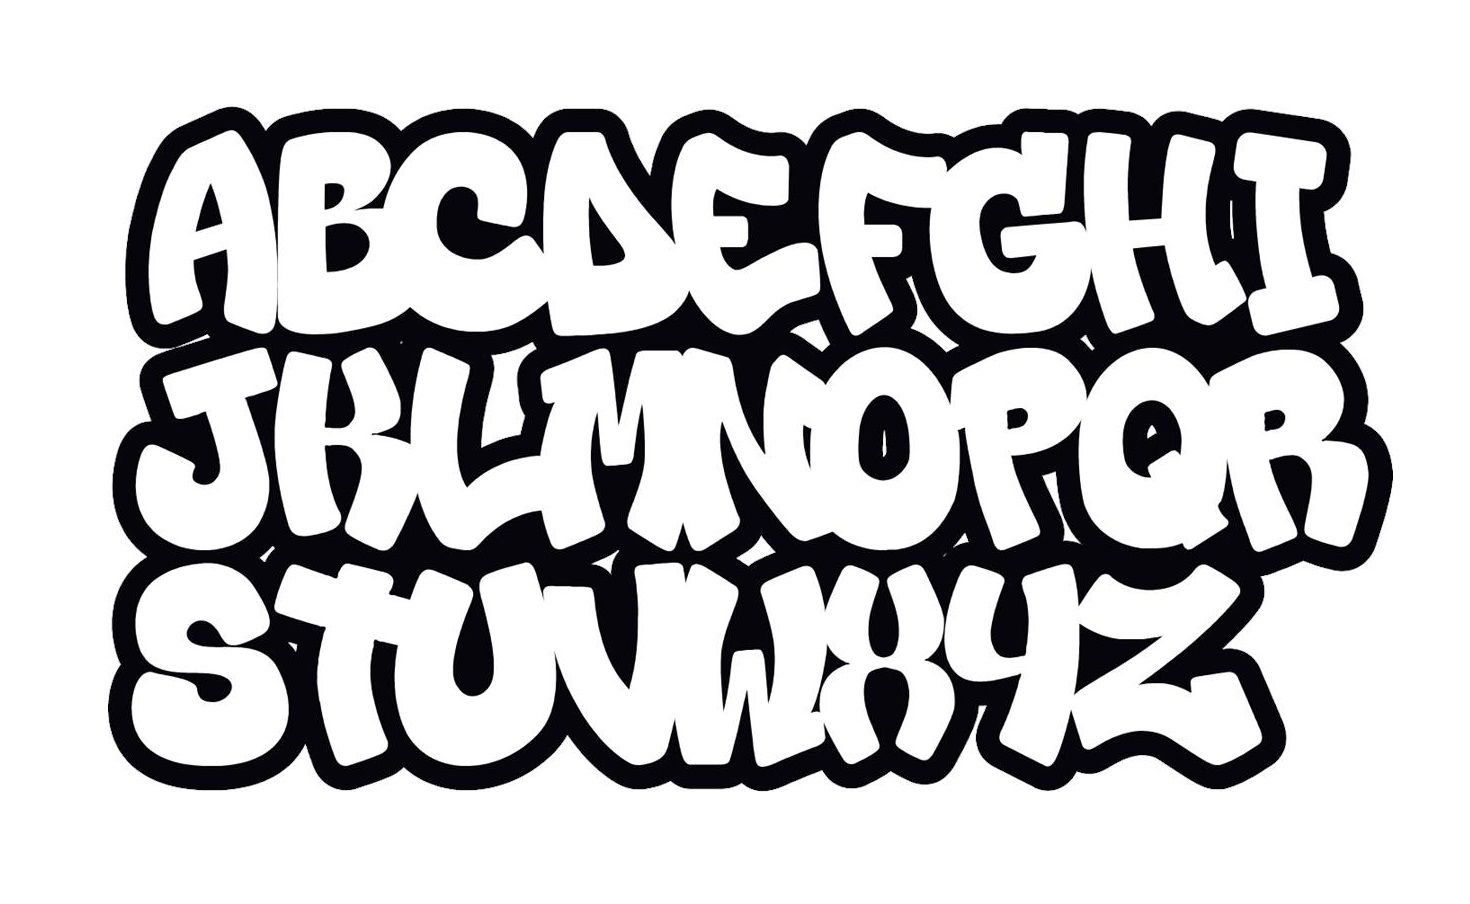 Das Beste Graffiti Buchstaben Abc Graffiti Schrift Alphabet Graffiti Schrift Und Bilder Graffiti Buchstaben Graffiti Schrift Graffiti Schriftart